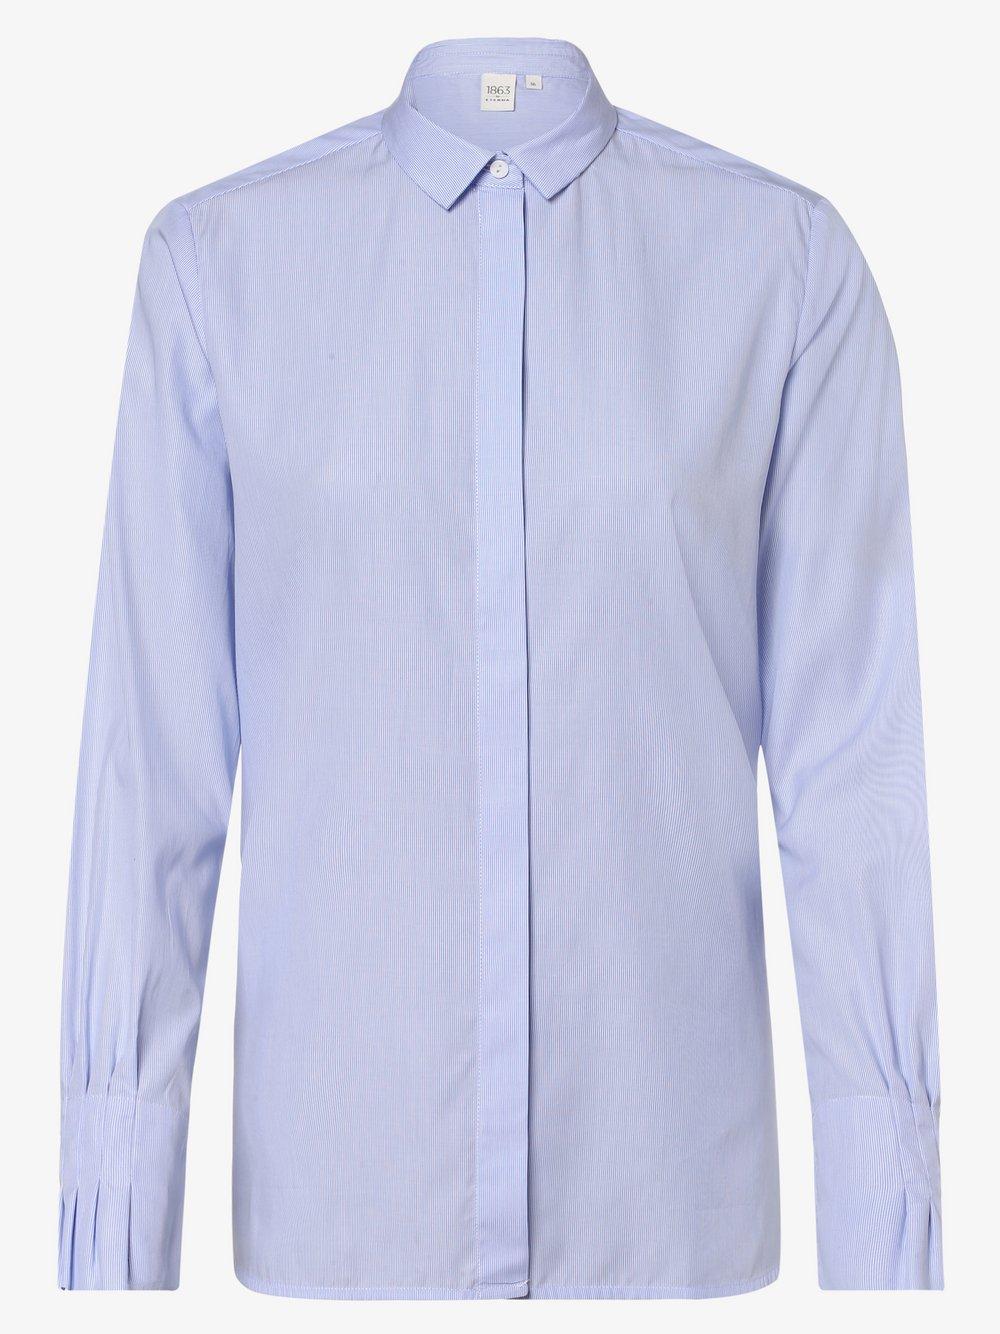 Eterna Premium – Bluzka damska, niebieski Van Graaf 442780-0001-00360